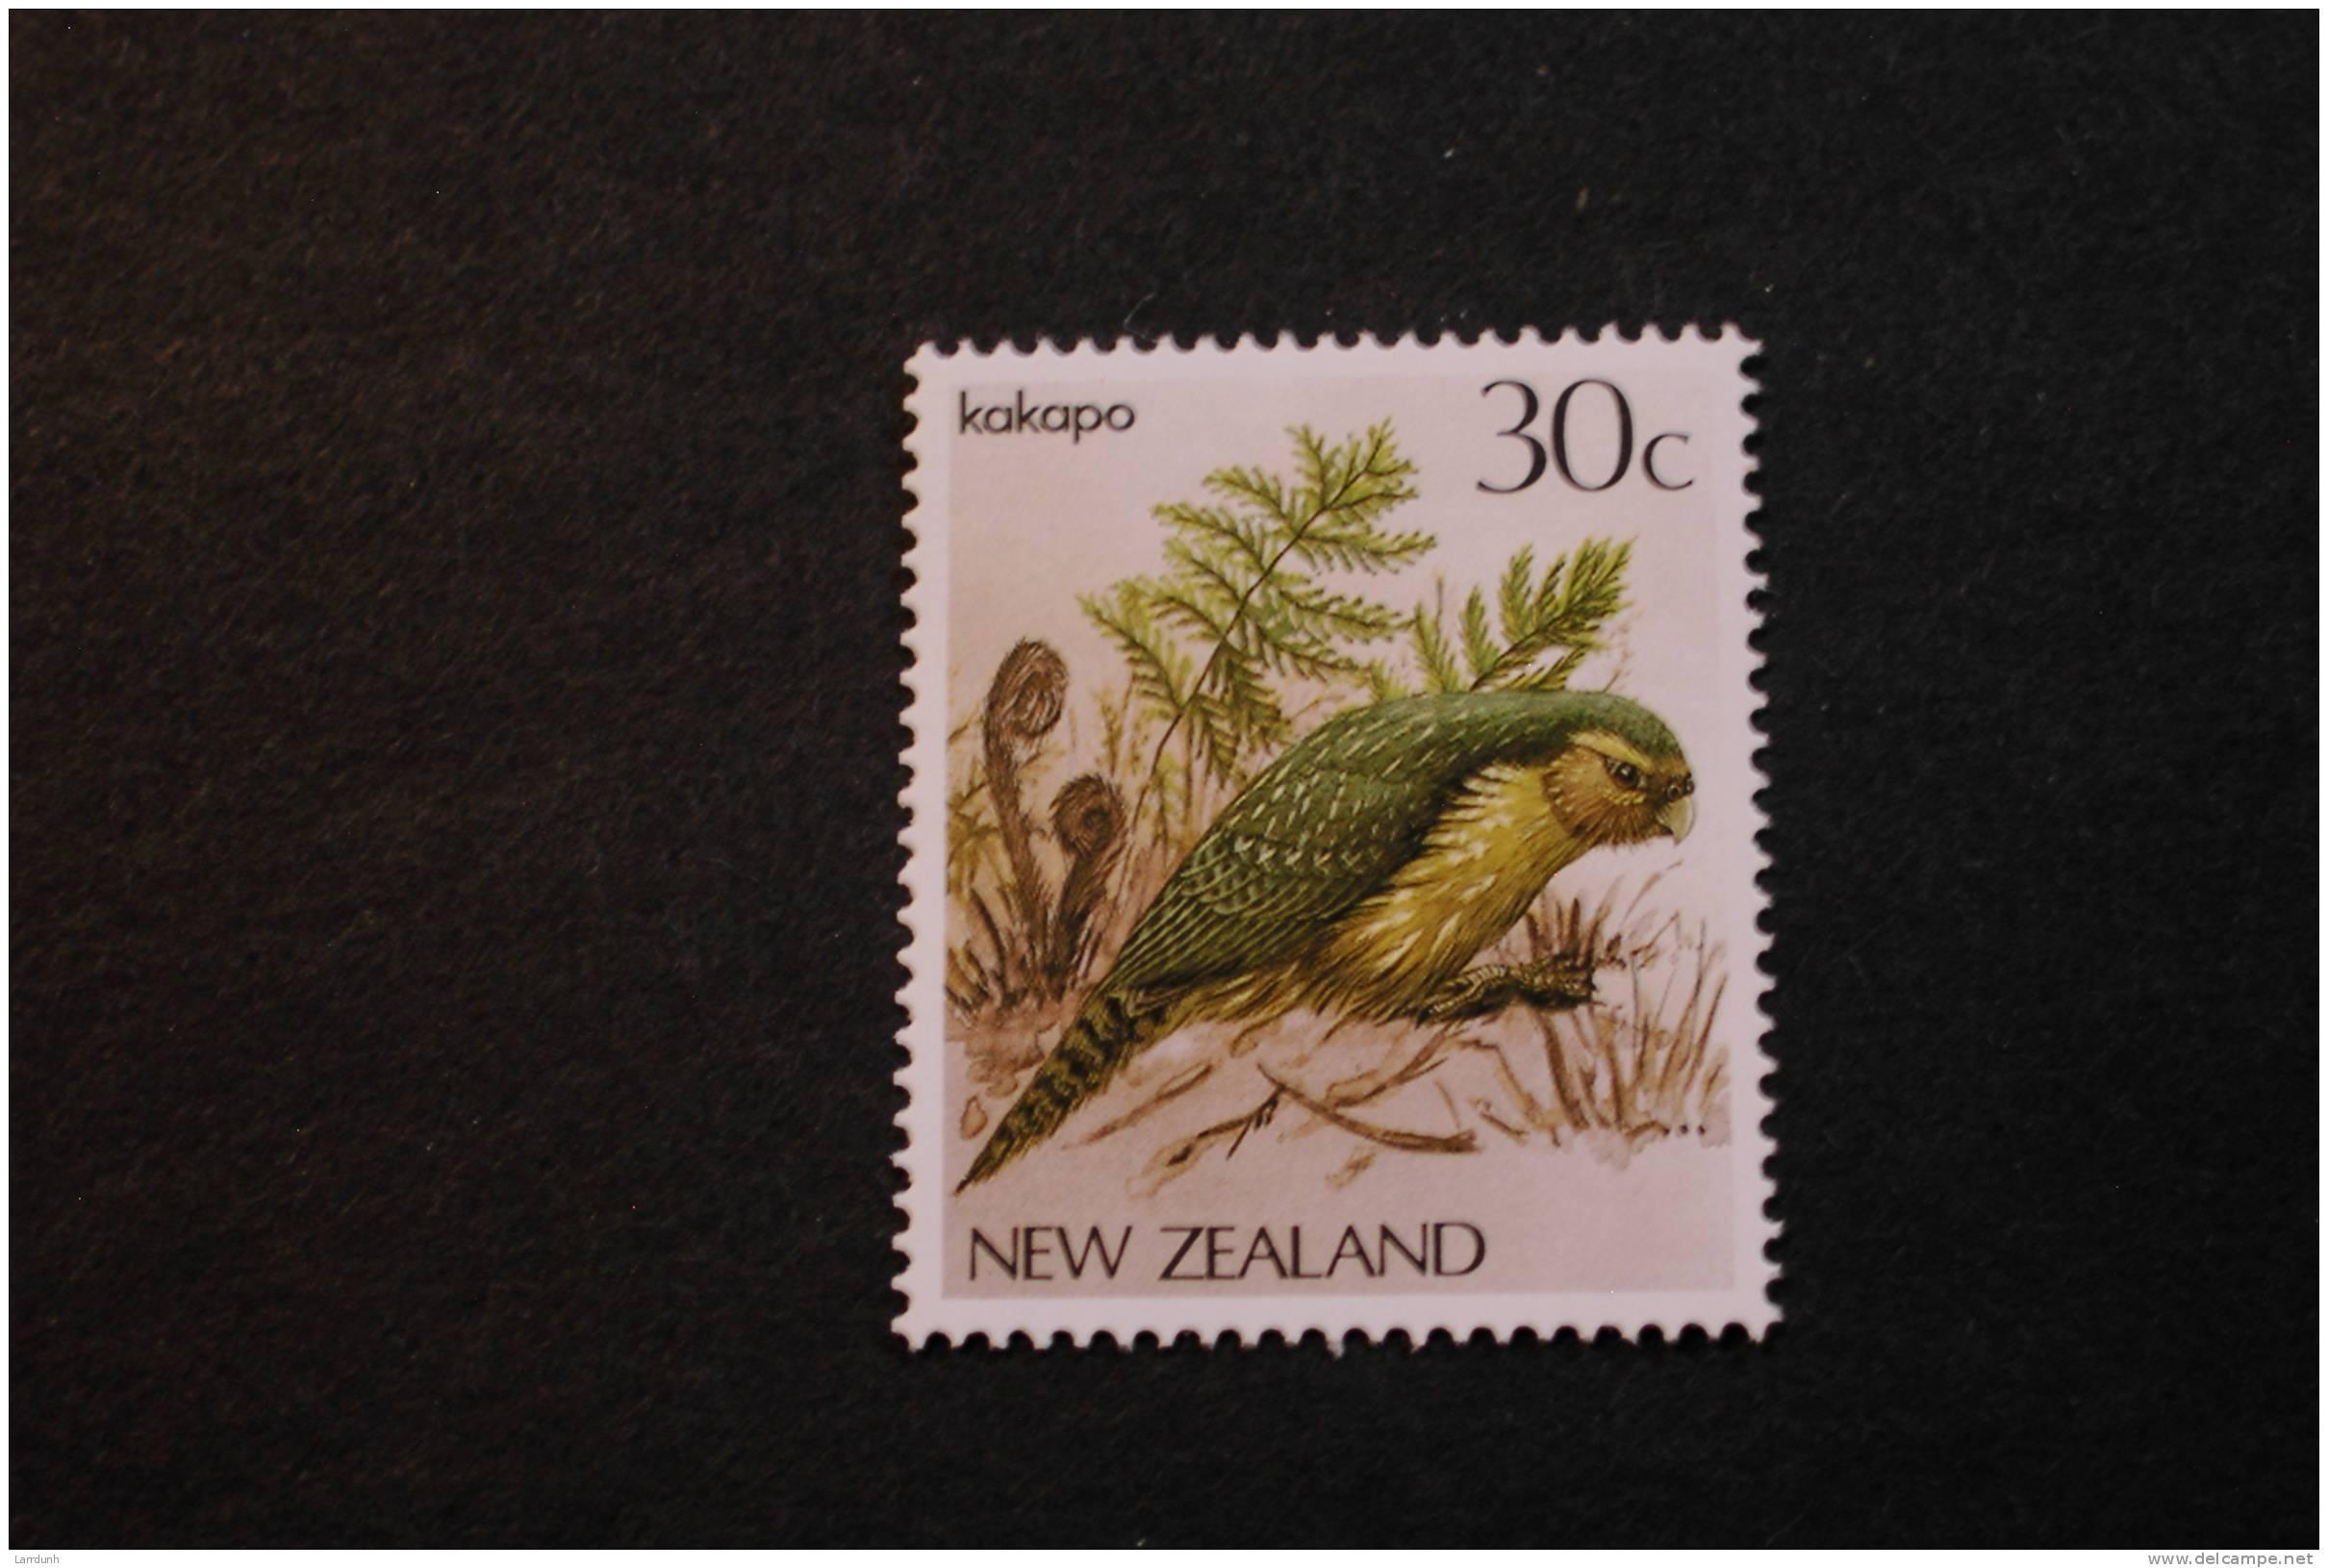 New Zealand 766 Native Bird Kakapo MNH 1985-89  A04s - Unclassified